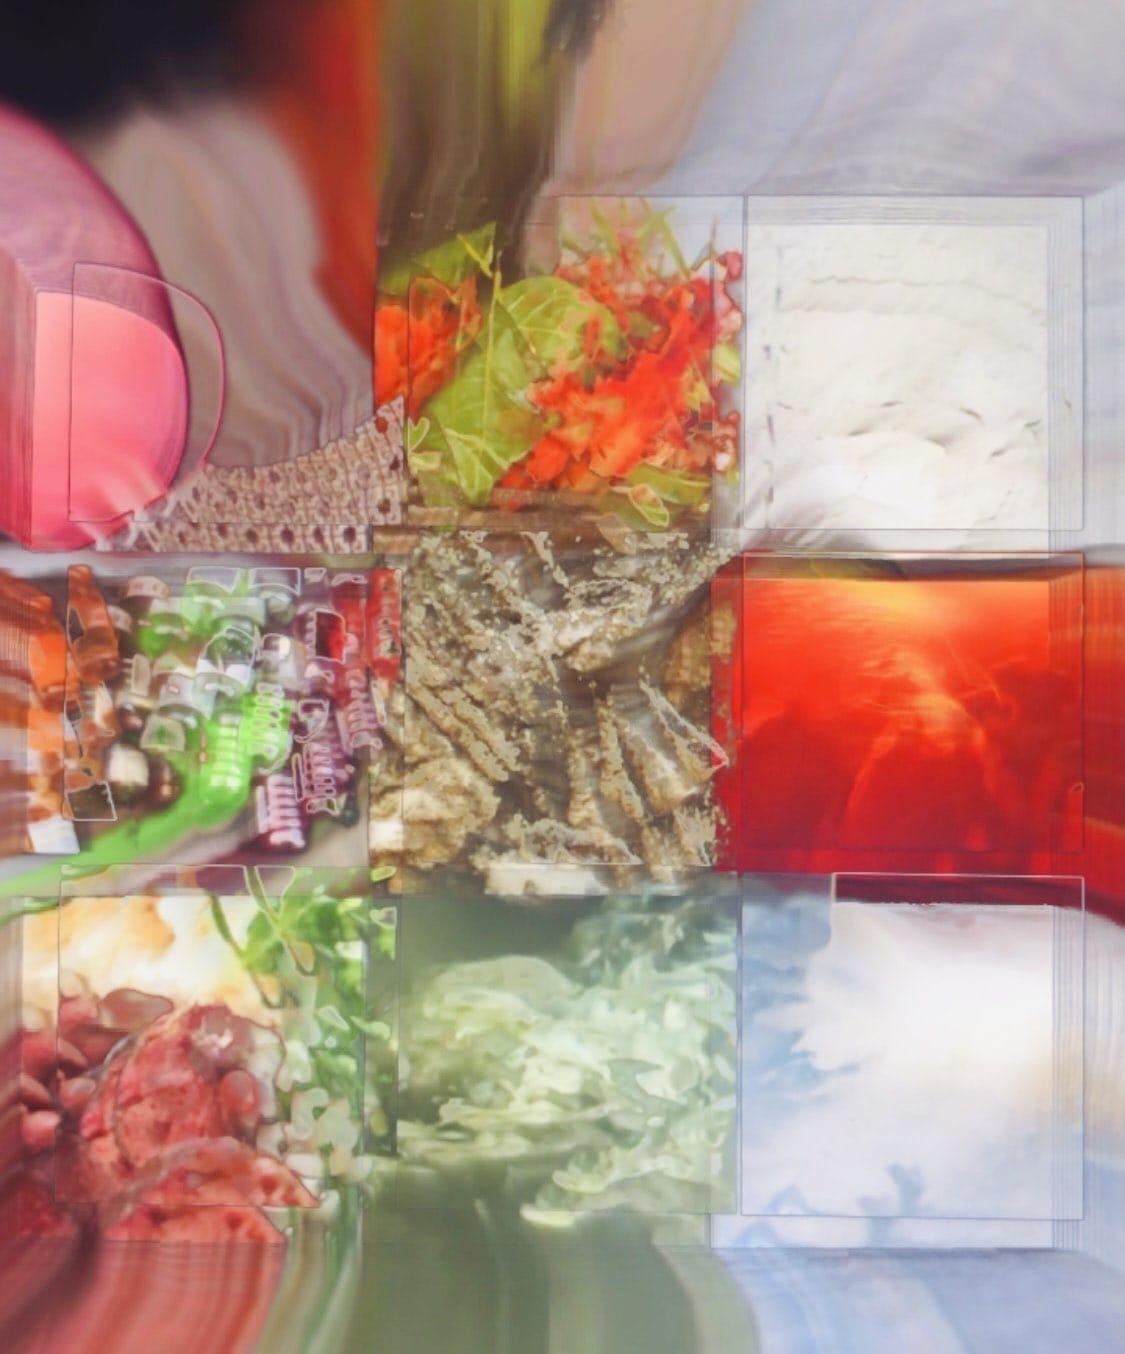 Shedhalle – Protozone4 Extra Worlding: Hi-Intensity & ZURICH ART WEEKEND